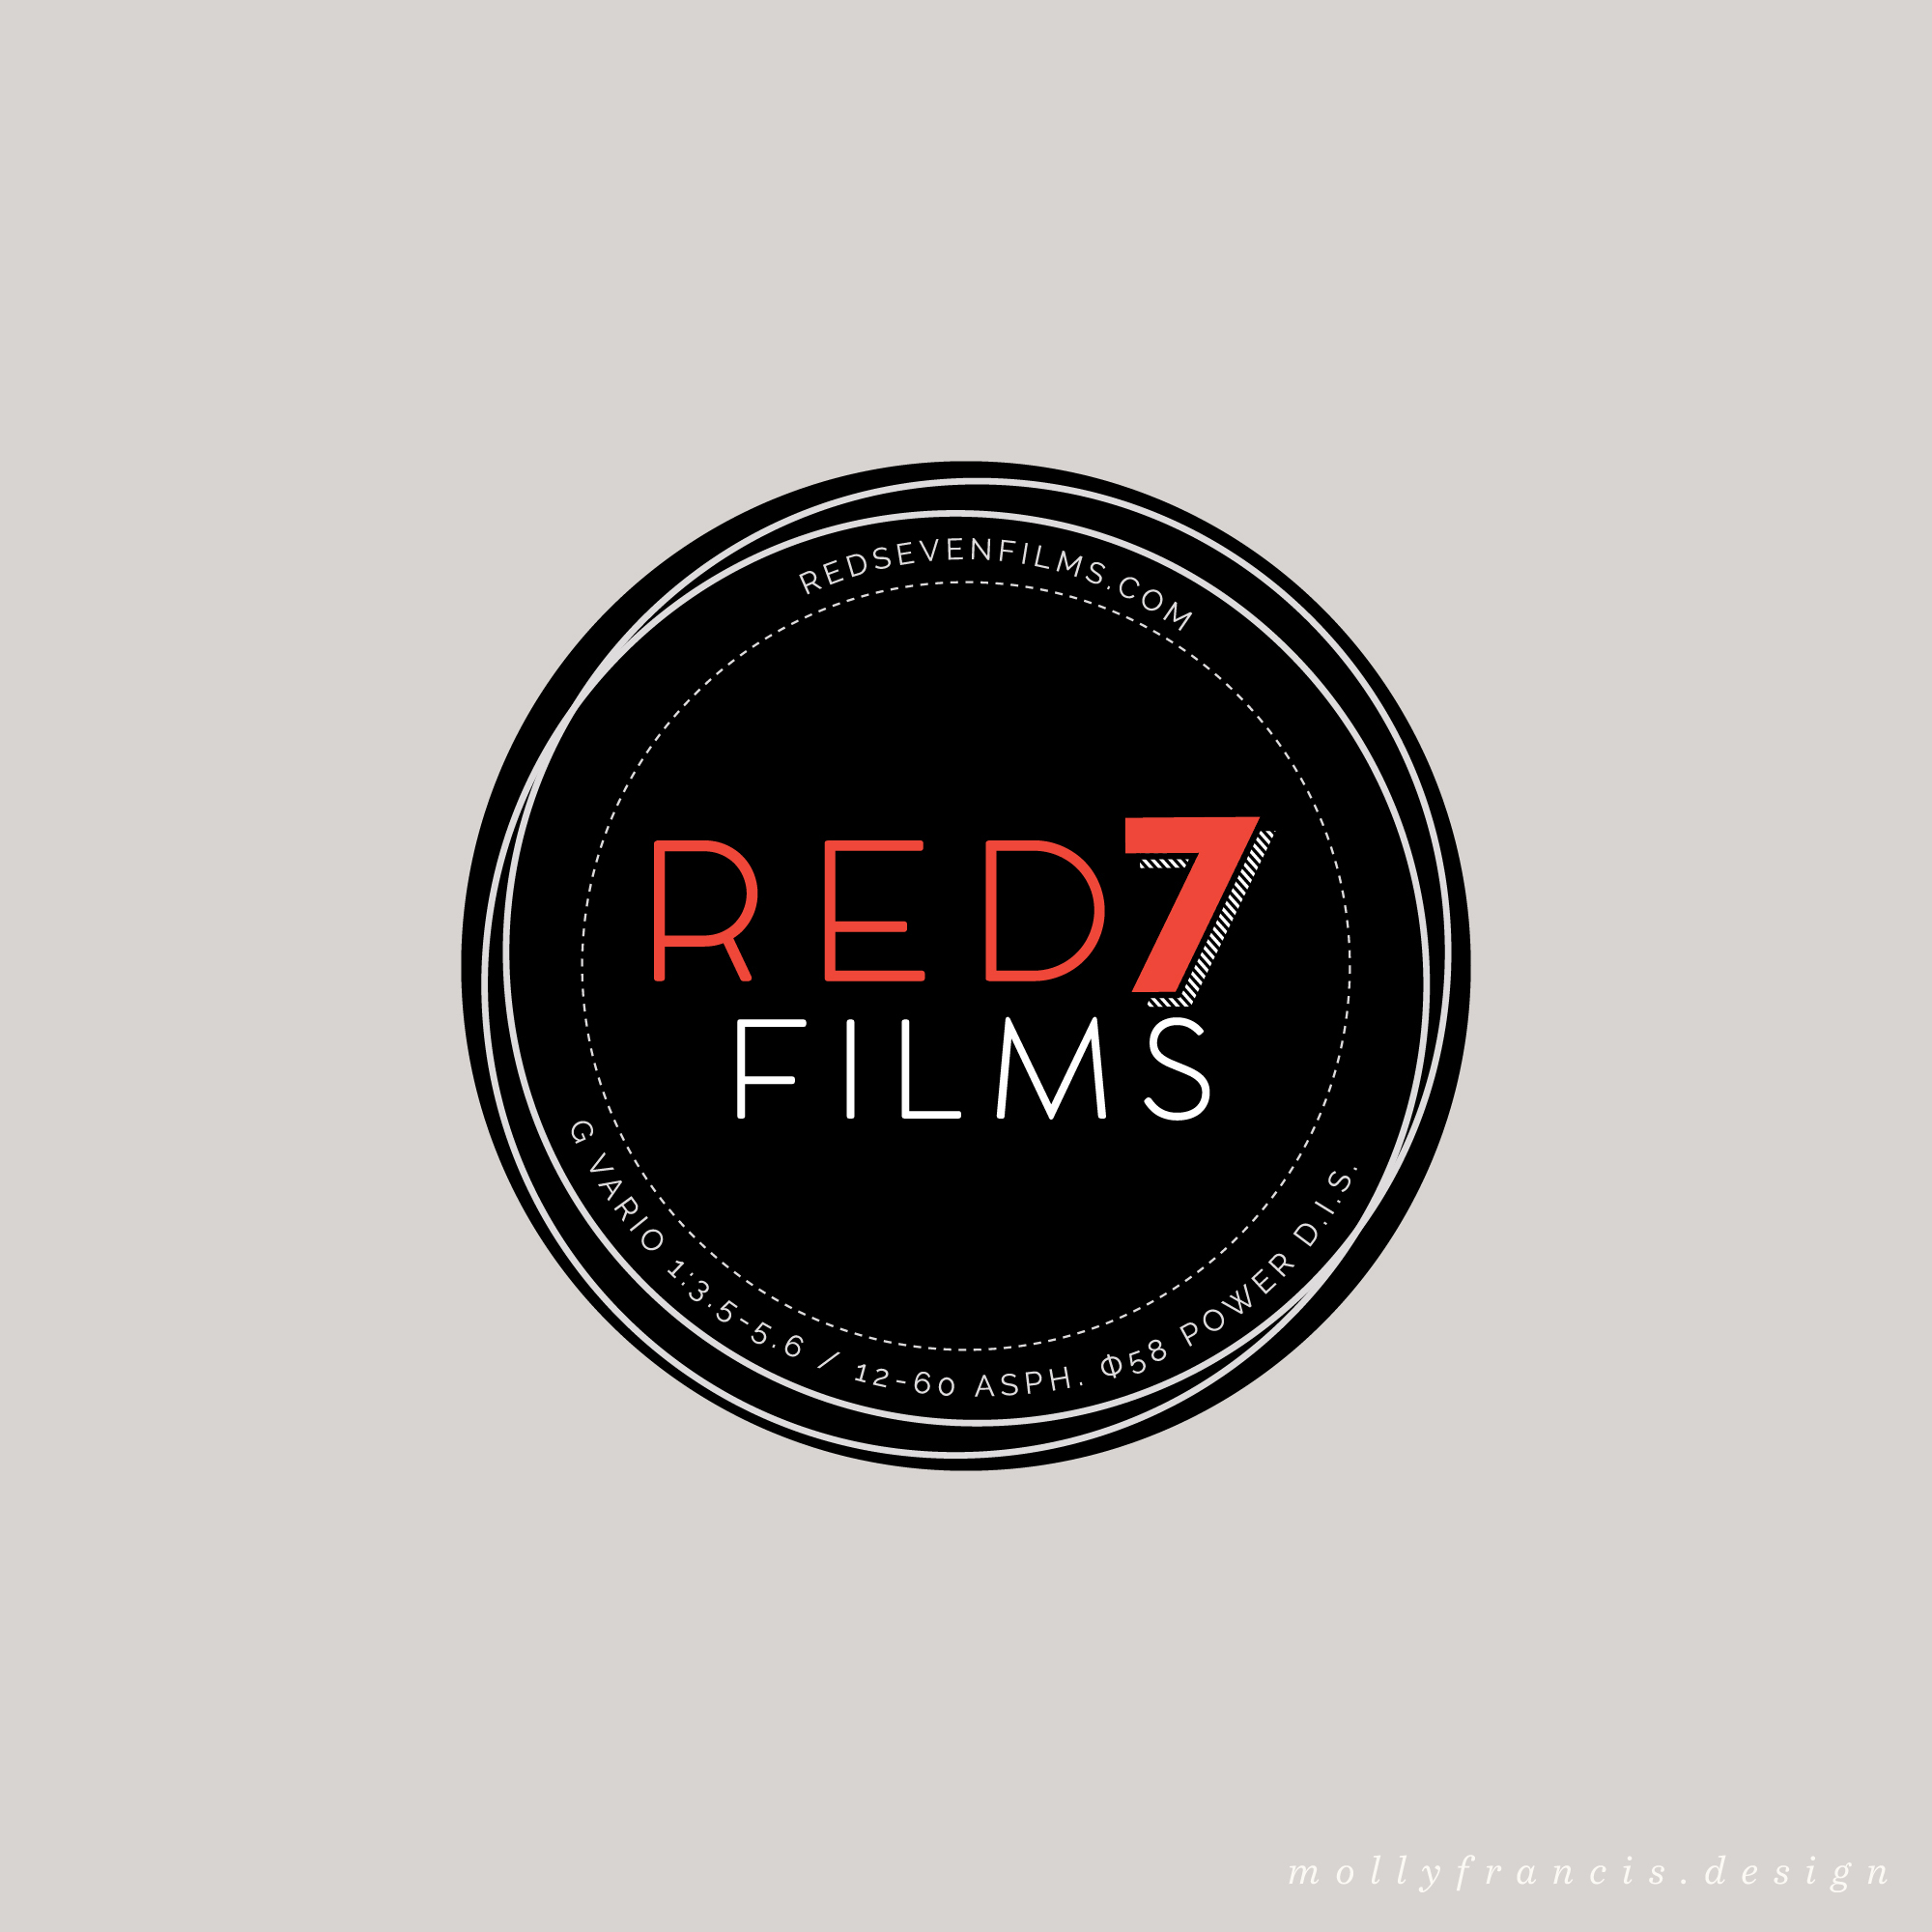 red 7 films logo